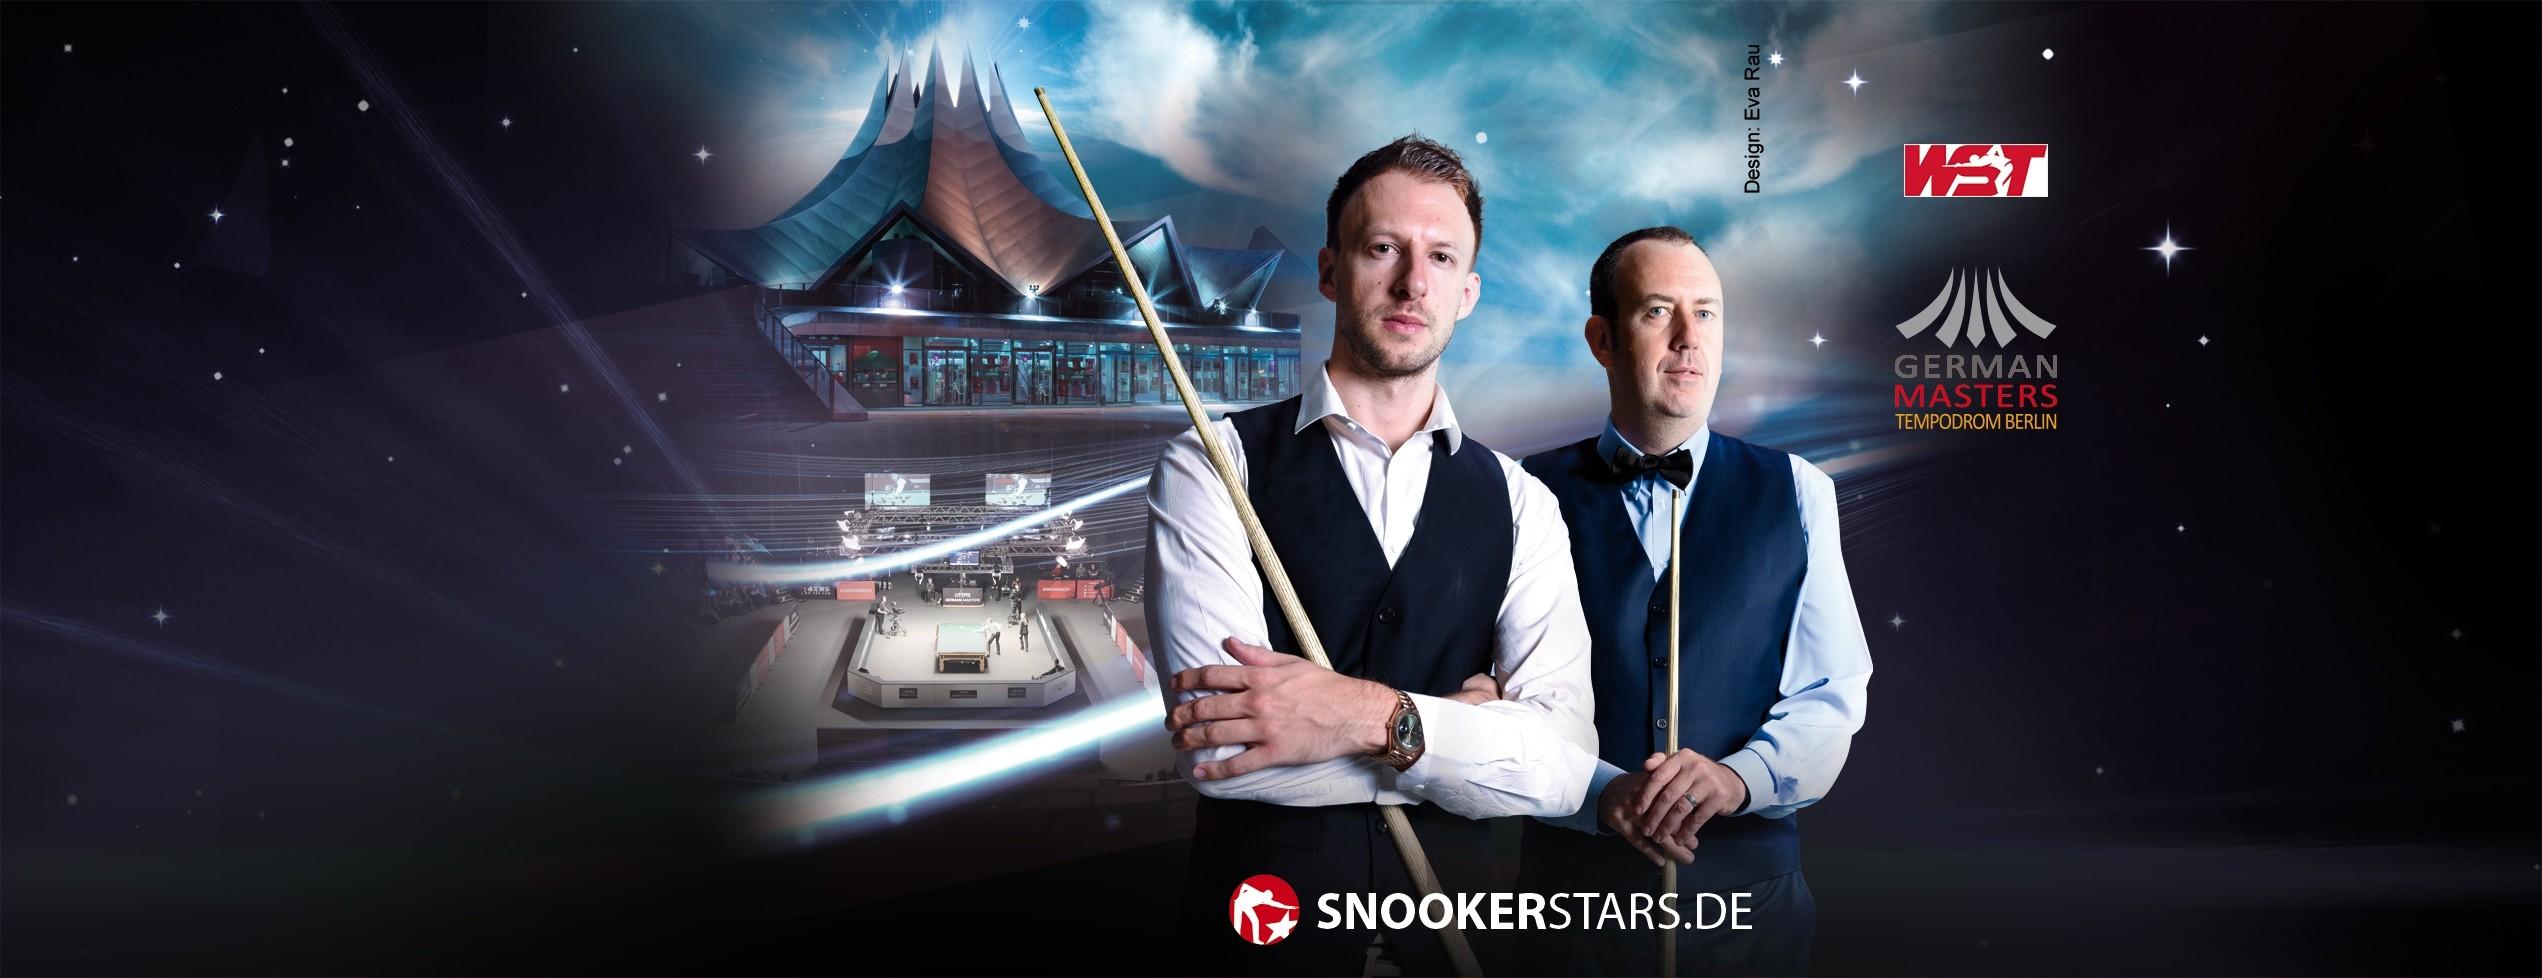 German Masters 27.01.2022 KAT 2 alle drei Sessions